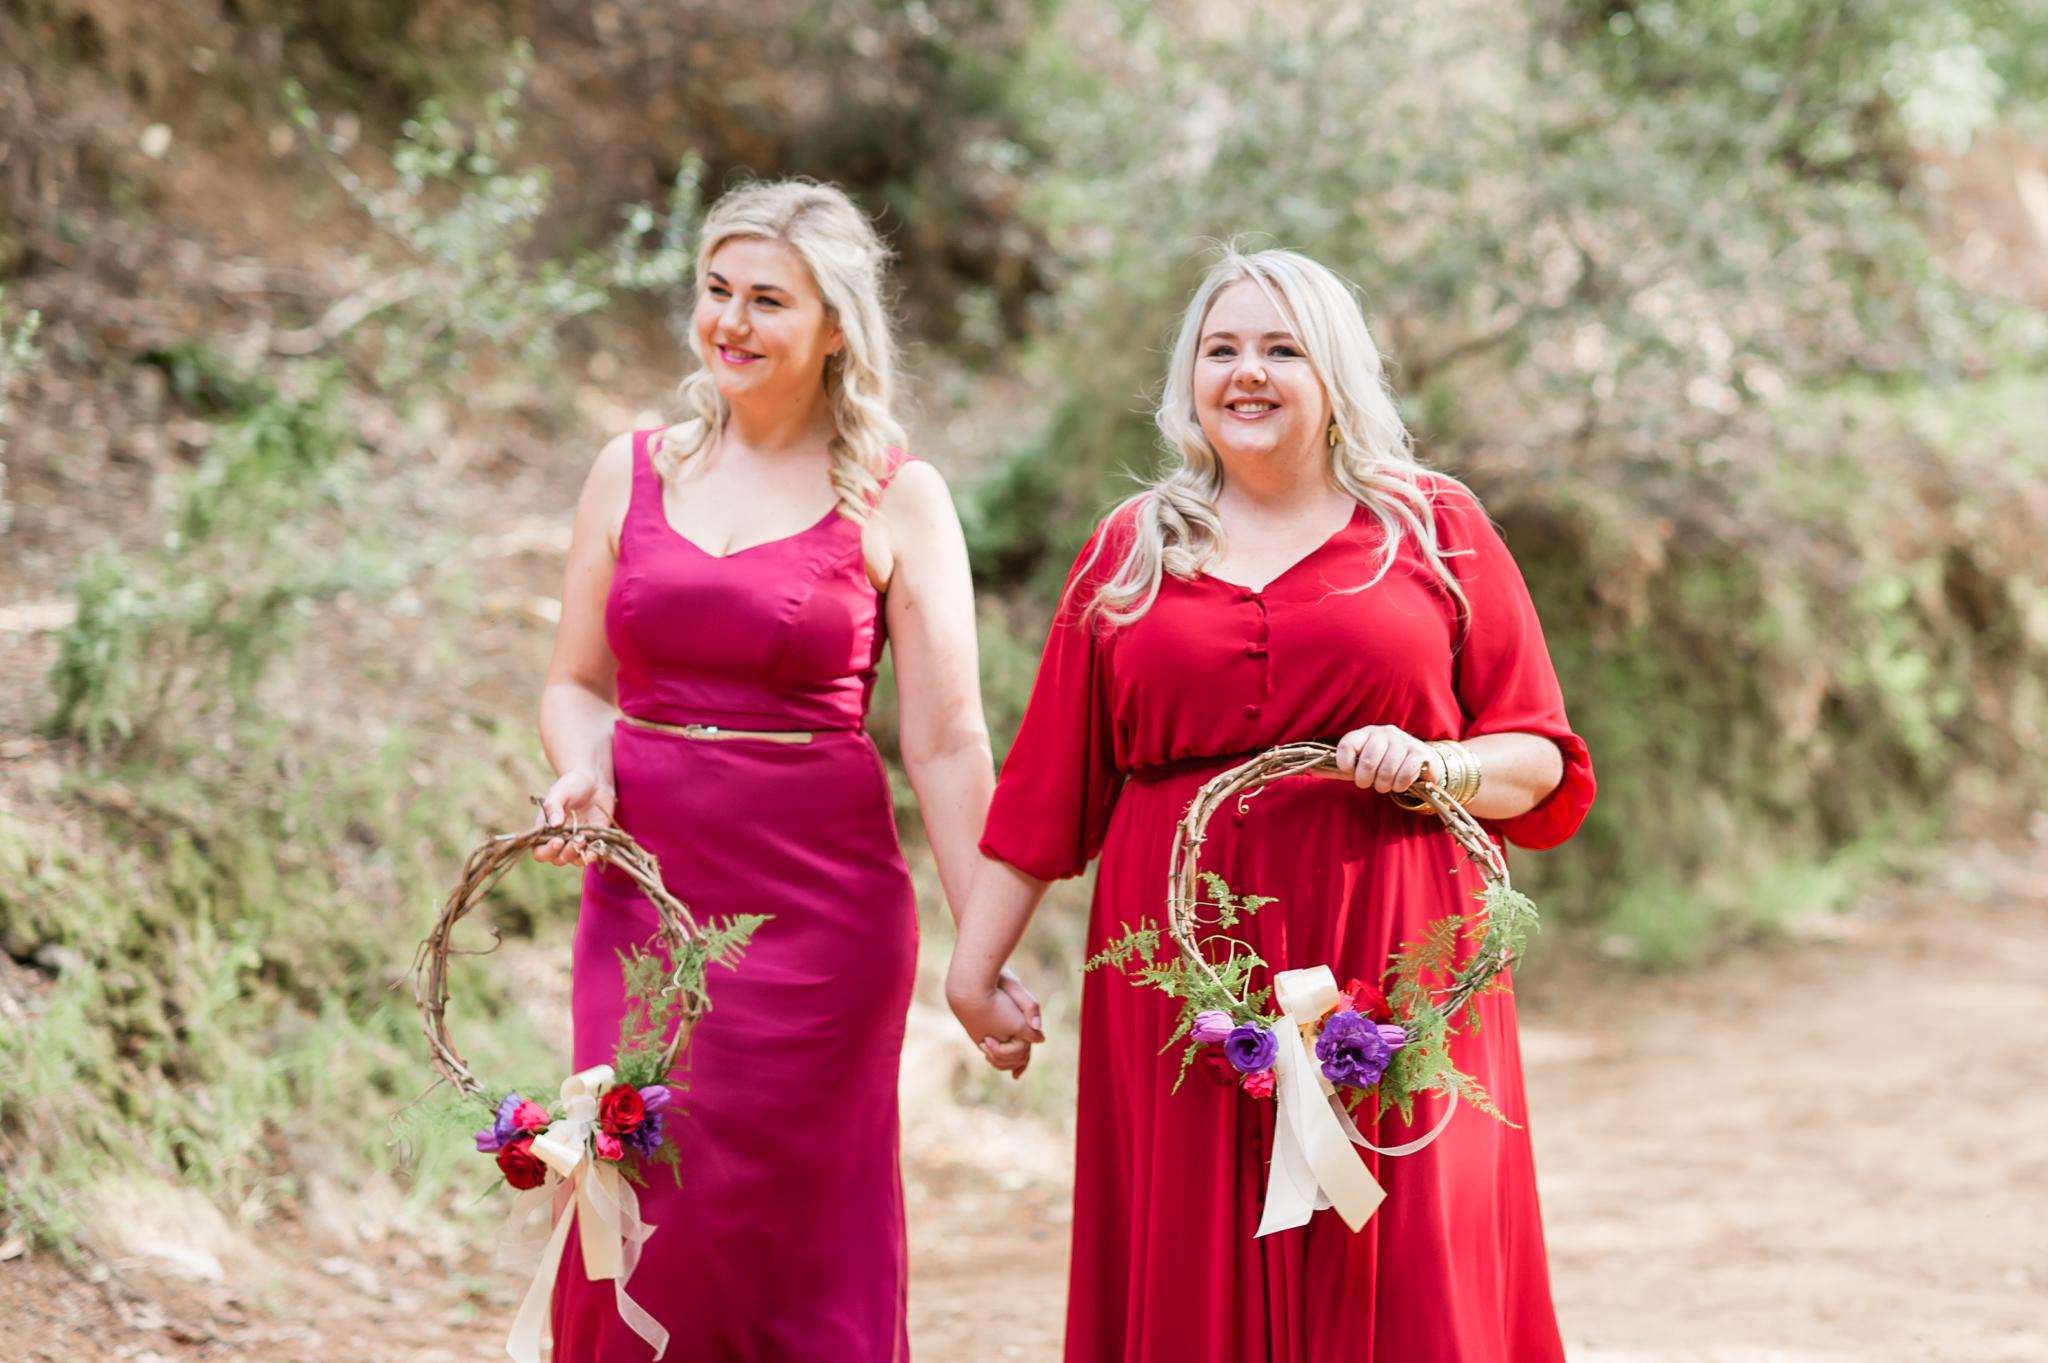 Angelique_Smith_Photography_Pieter&Yvonne_Wedding-217.jpg